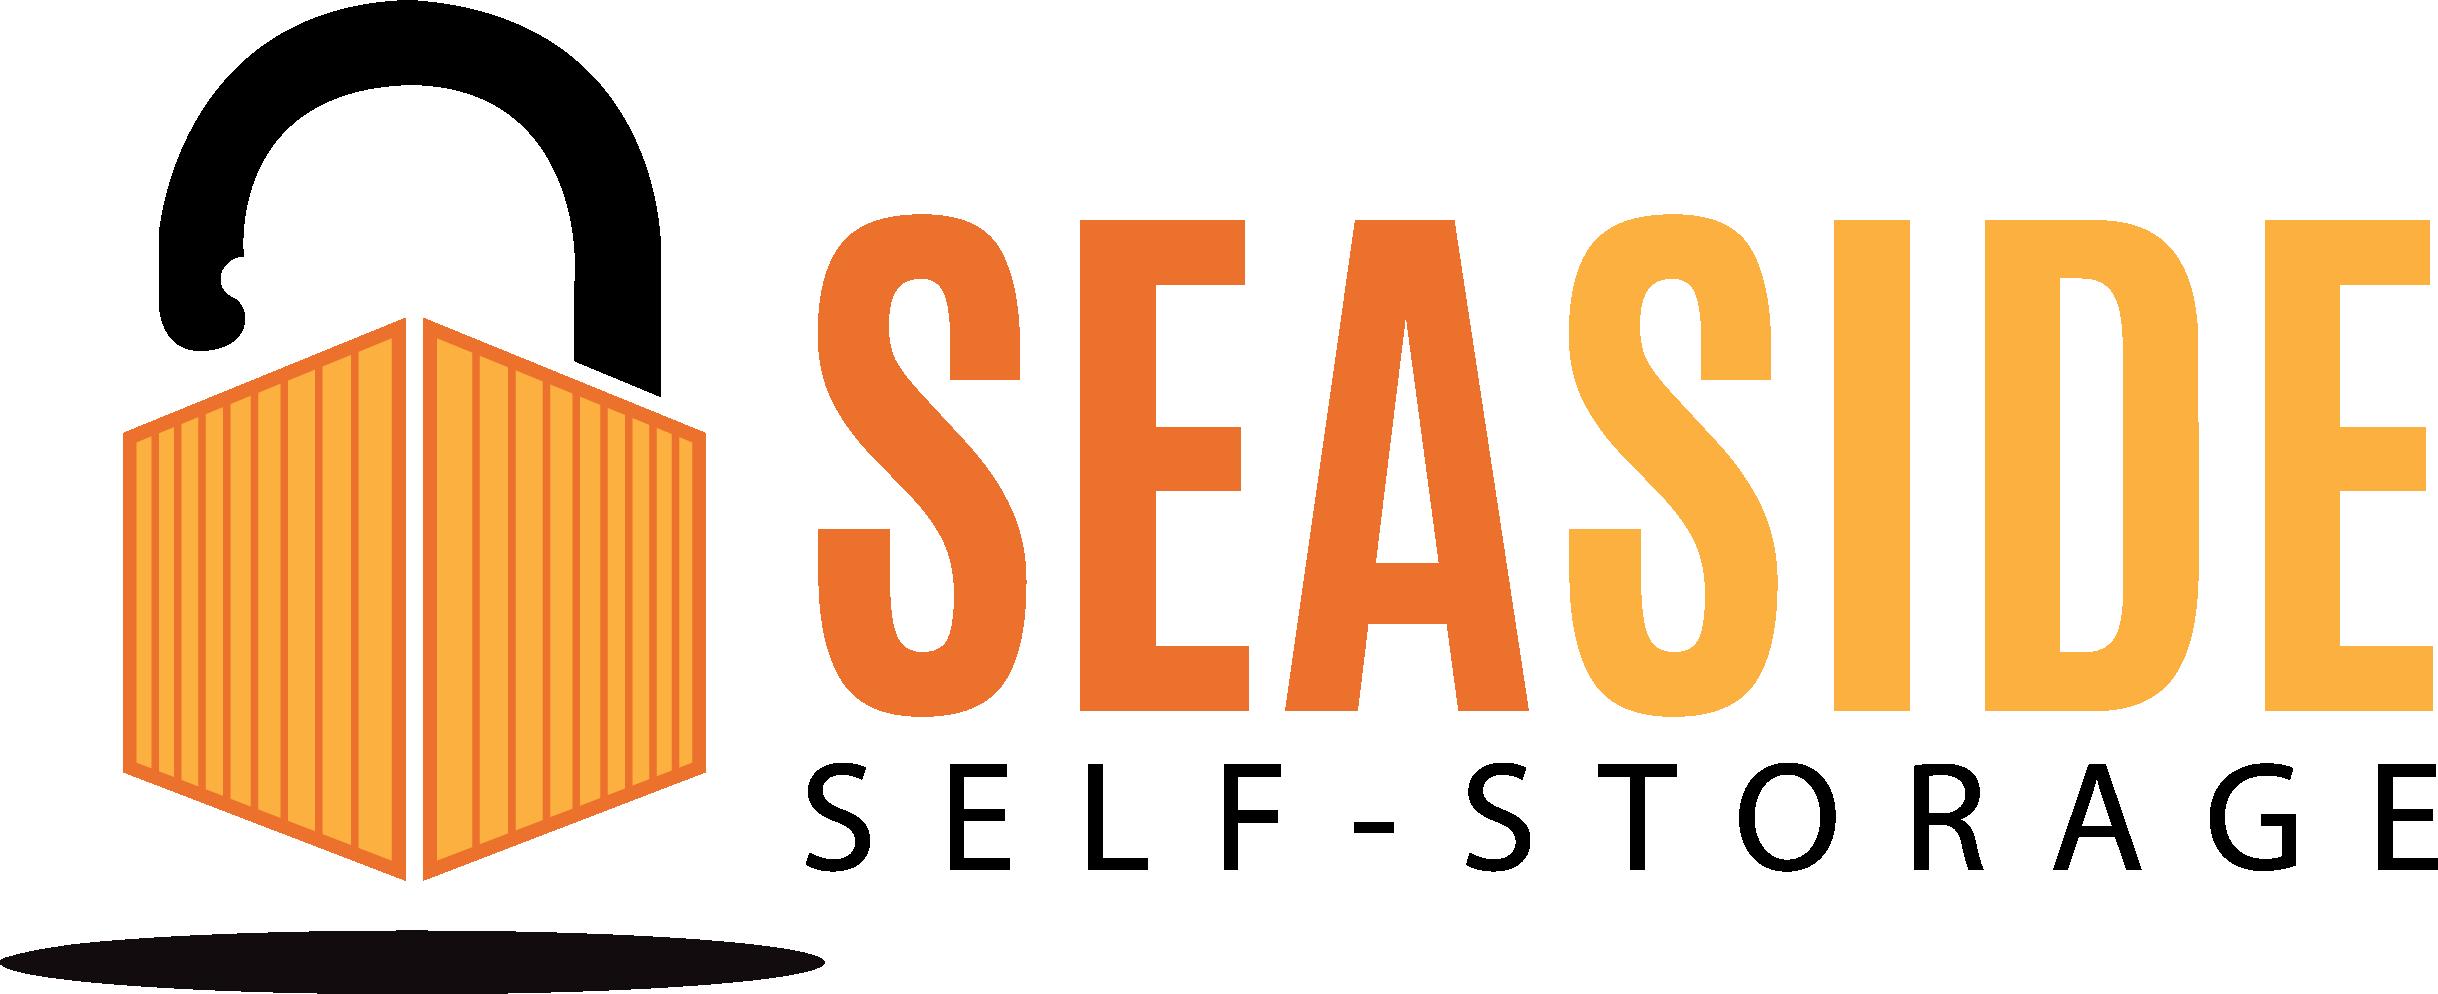 seaside-logo